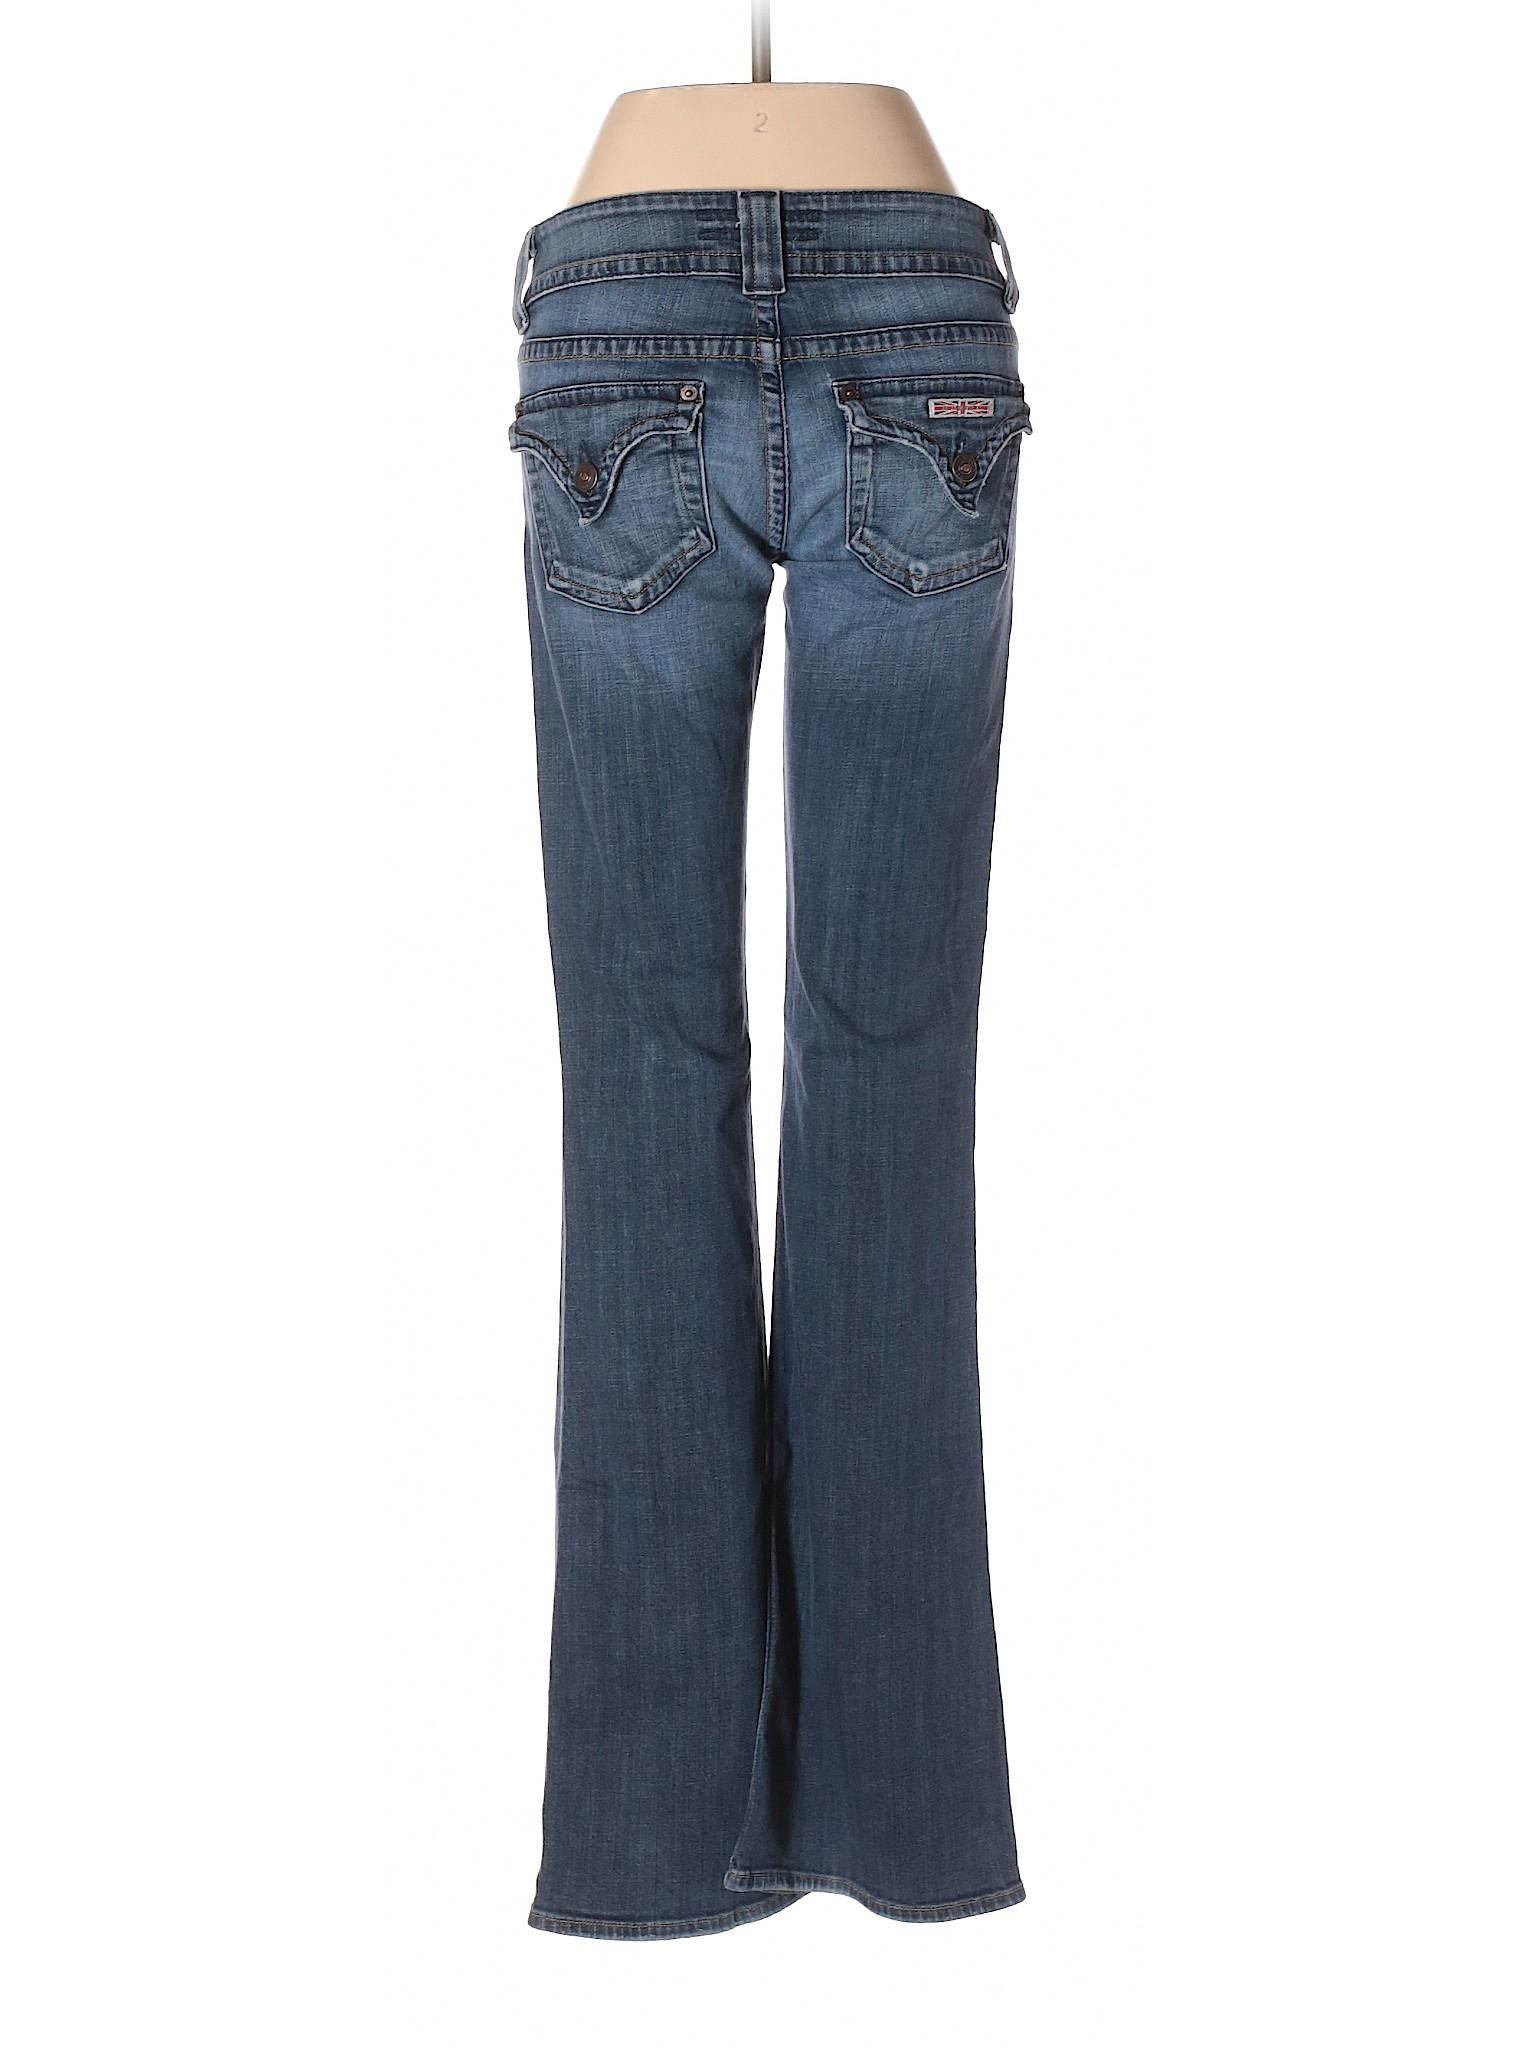 Hudson Promotion Promotion Promotion Promotion Jeans Jeans Hudson Hudson Jeans FPnqgw